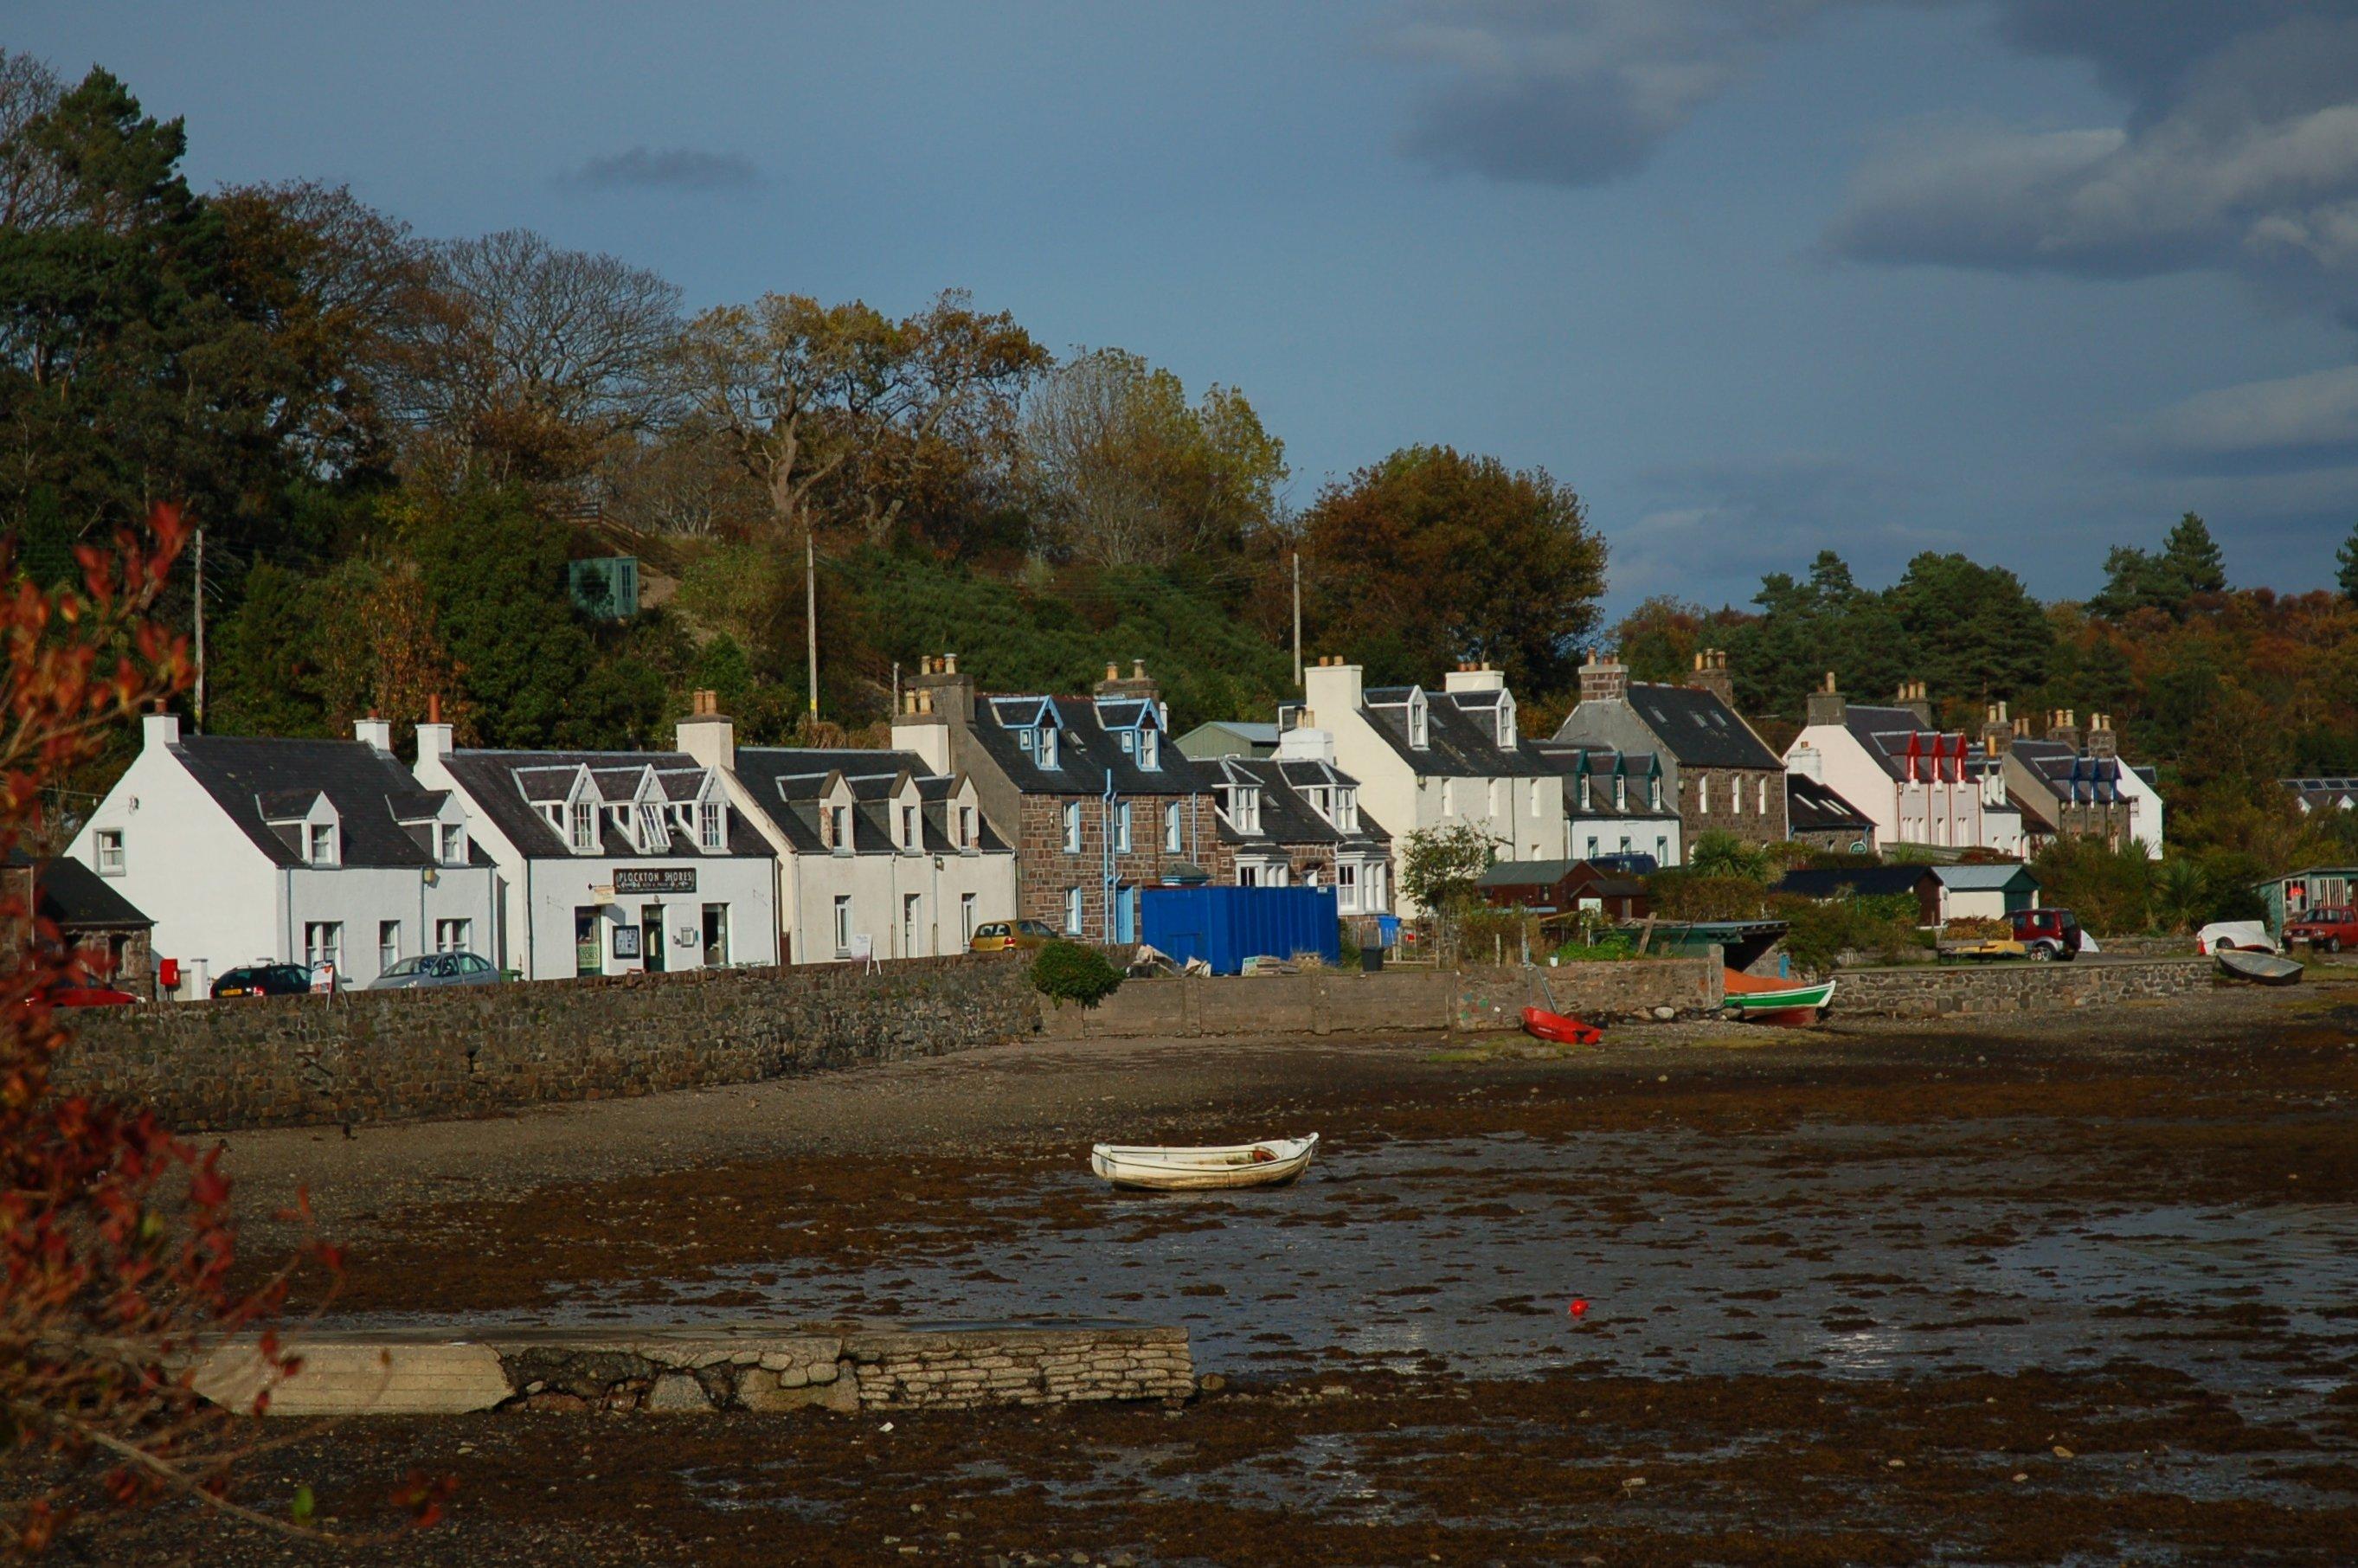 A photo of the shorefront at Plockton